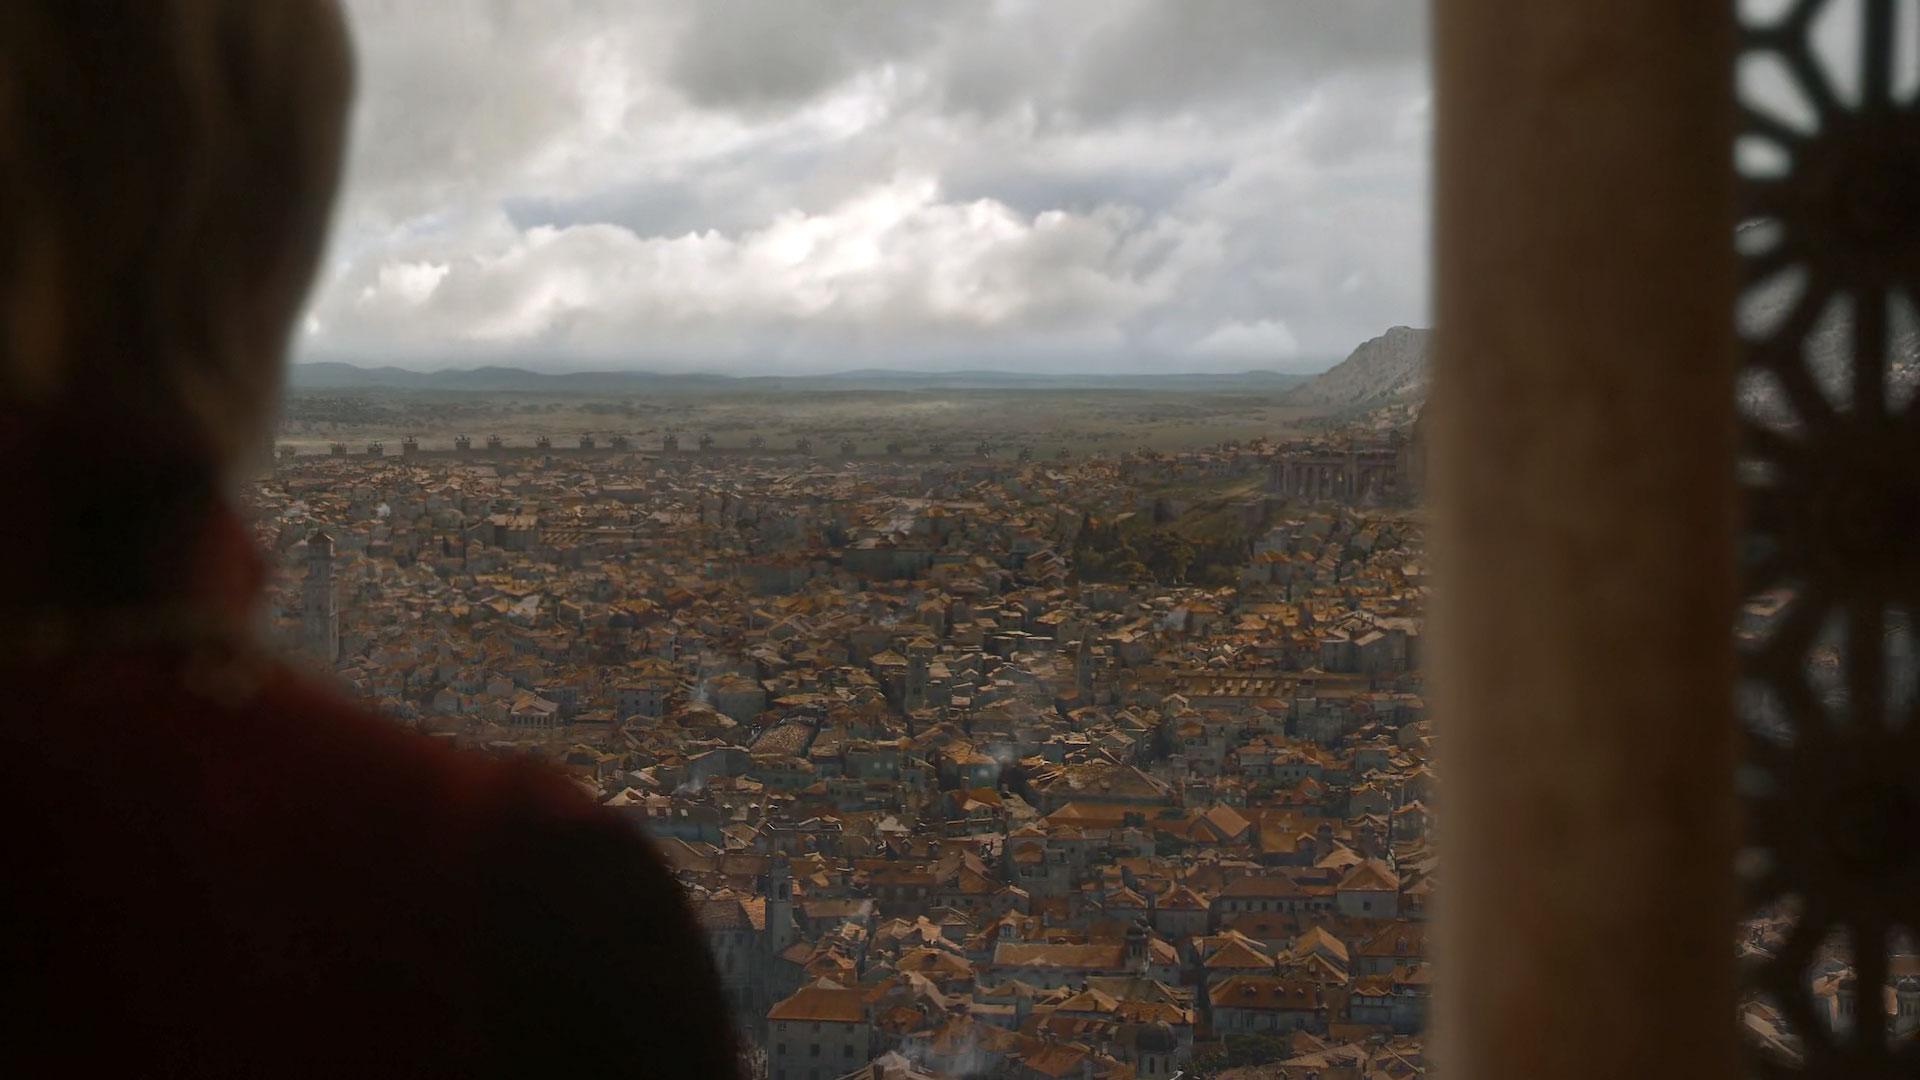 تصاویر قسمت ۵ فصل ۸ گیم آف ترونز